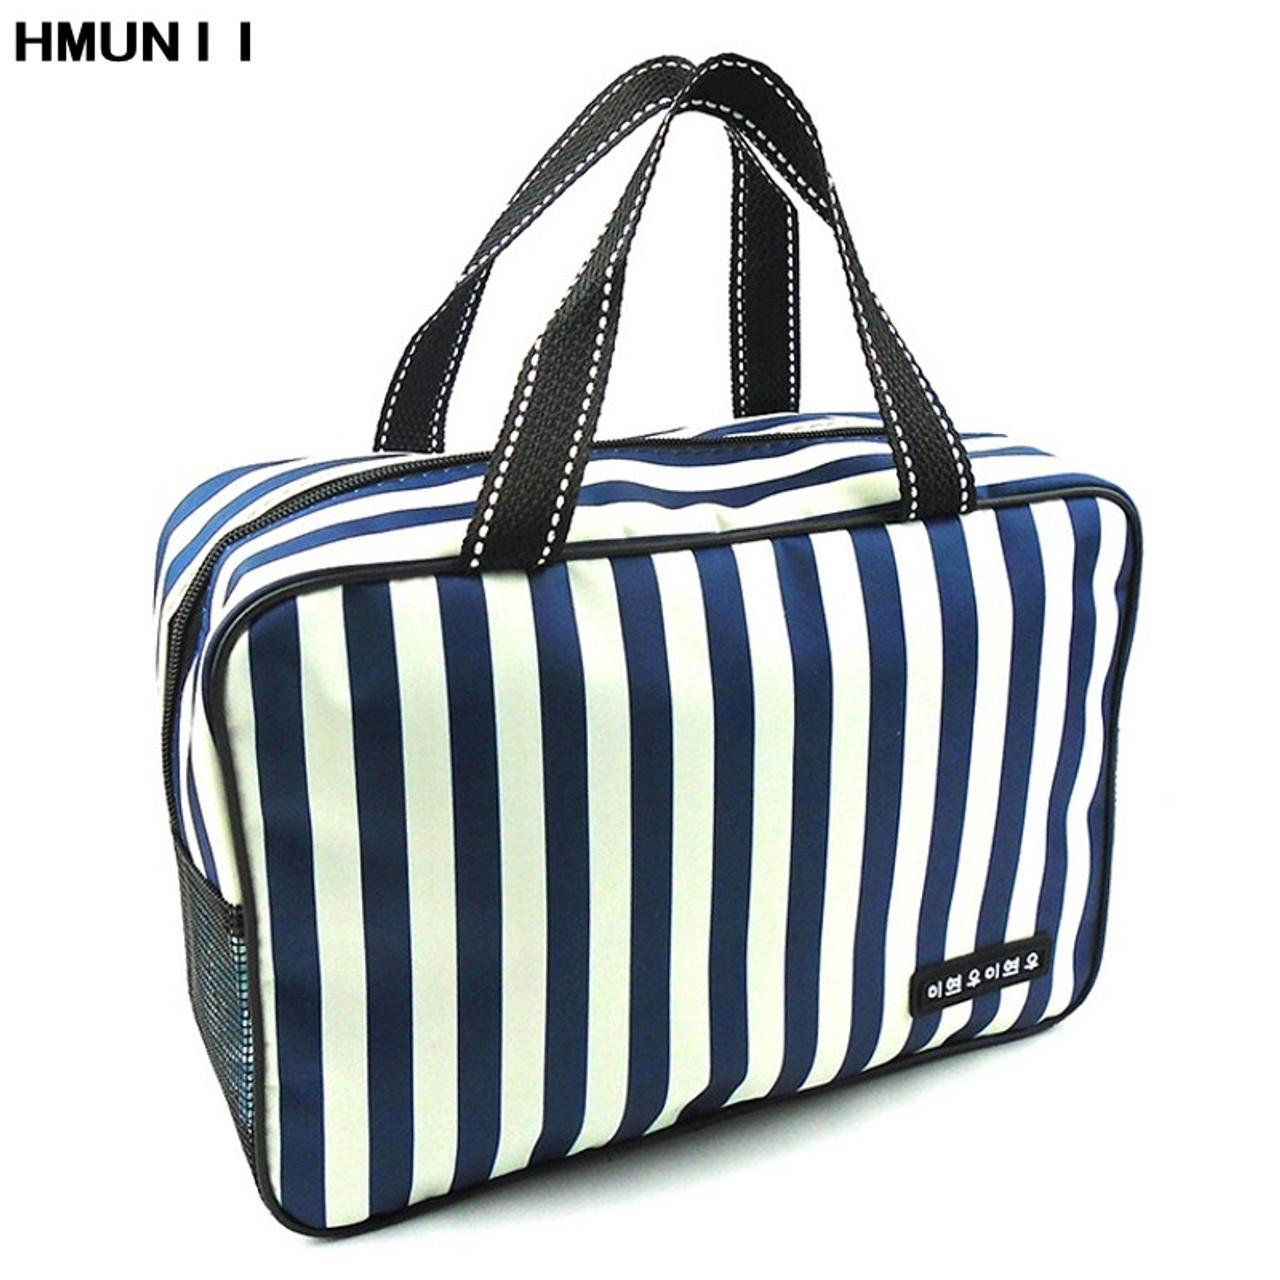 d8ca5da897c9 New Women And Men Large Waterproof Makeup Bag Oxford Cloth Travel Wash Bag  Organizer Case Necessaries ...